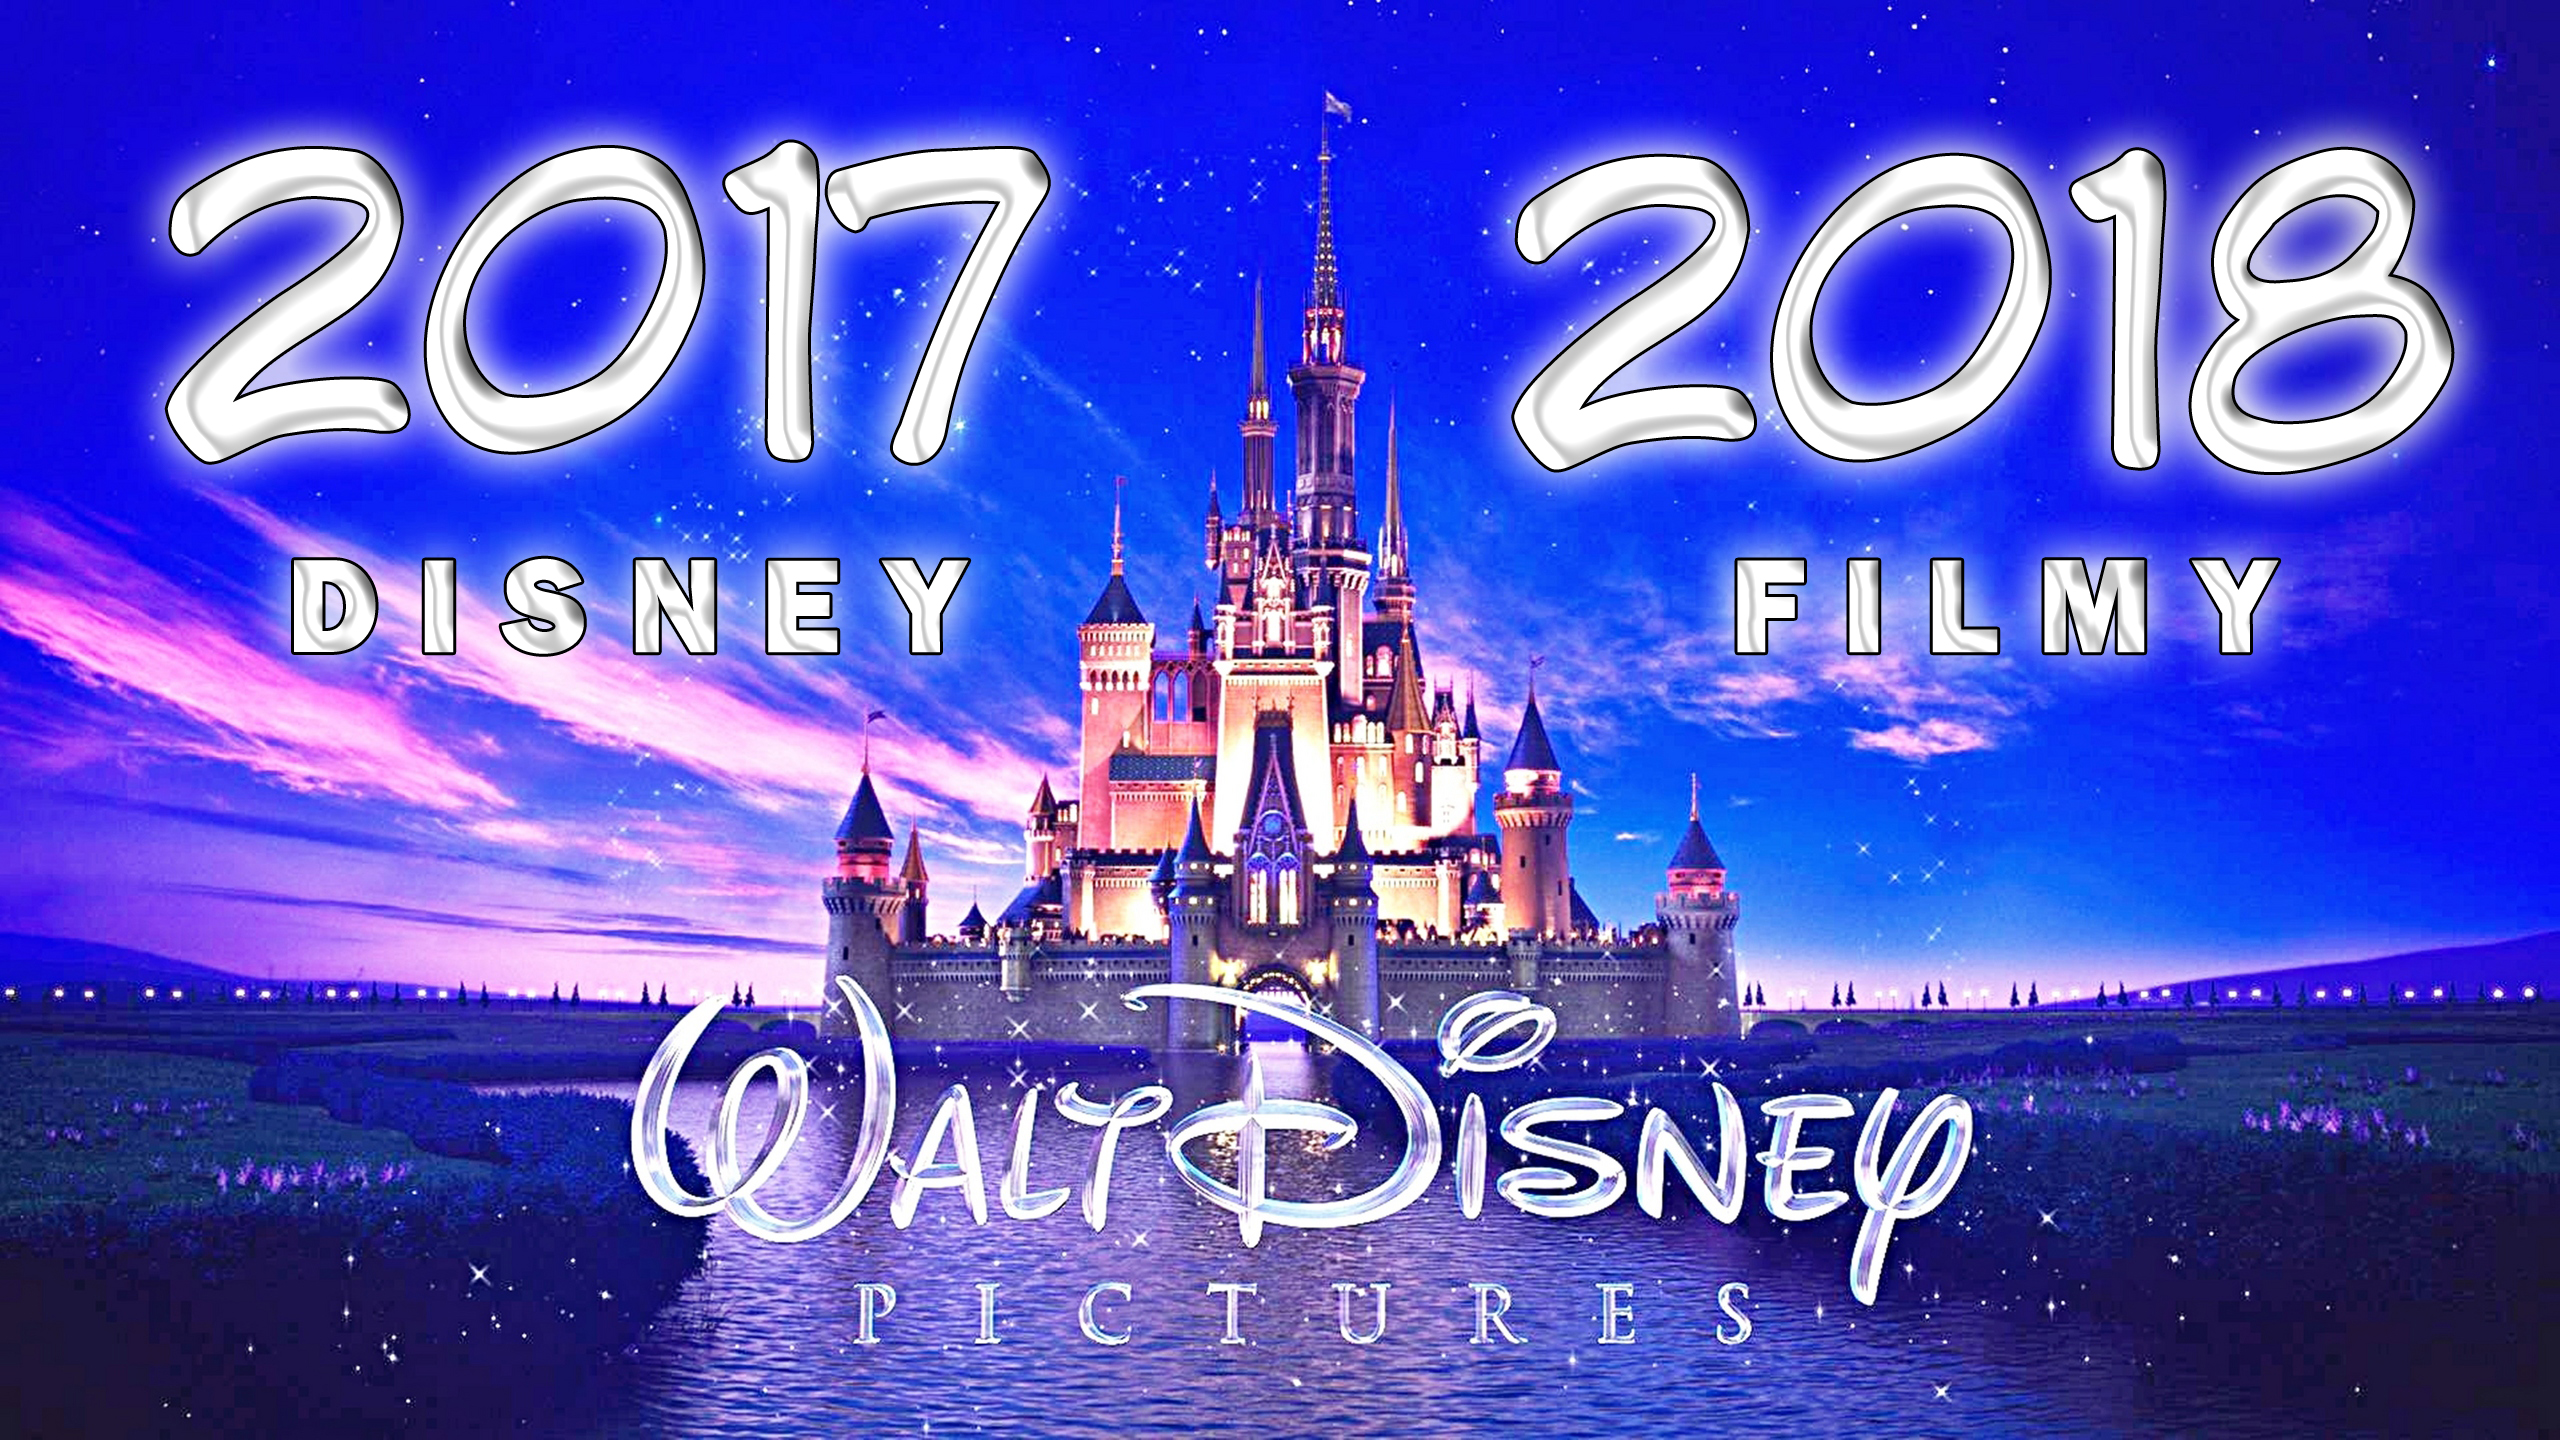 Disney filmy 2017 2018